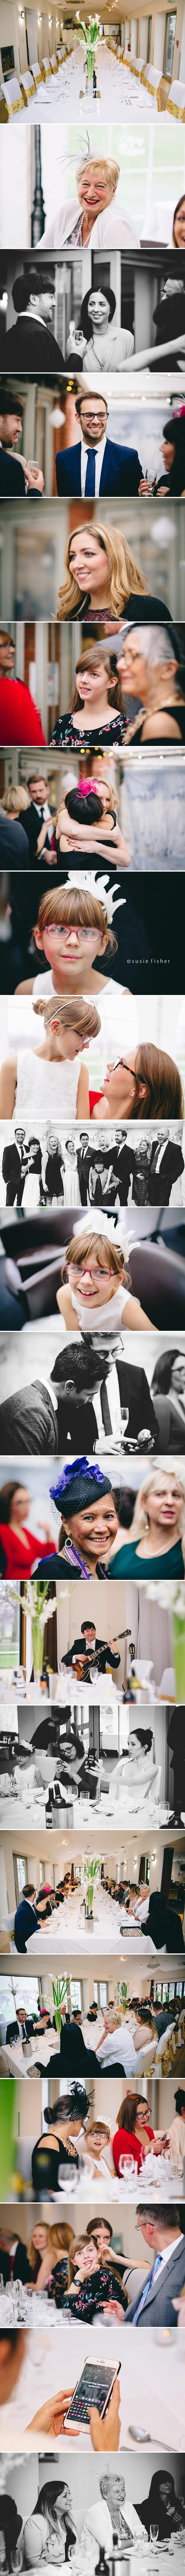 Wedding Photographer Woking_Susie Fisher Photography